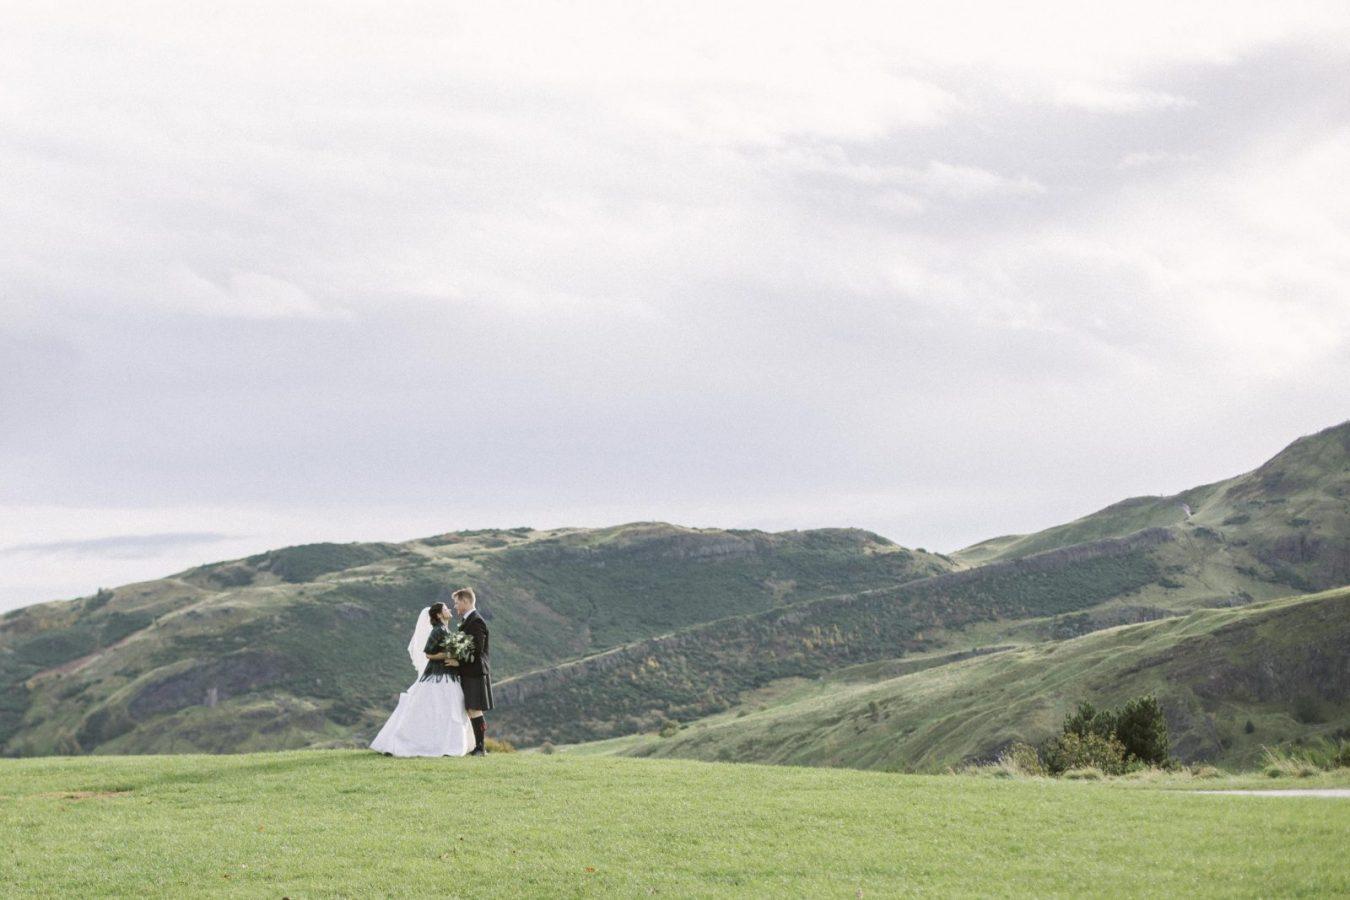 Edinburgh Castle Destination Elopement Photography | Calton Hill Edinburgh Wedding Photography | Romantic Scottish Destination Wedding | Ceranna Photo